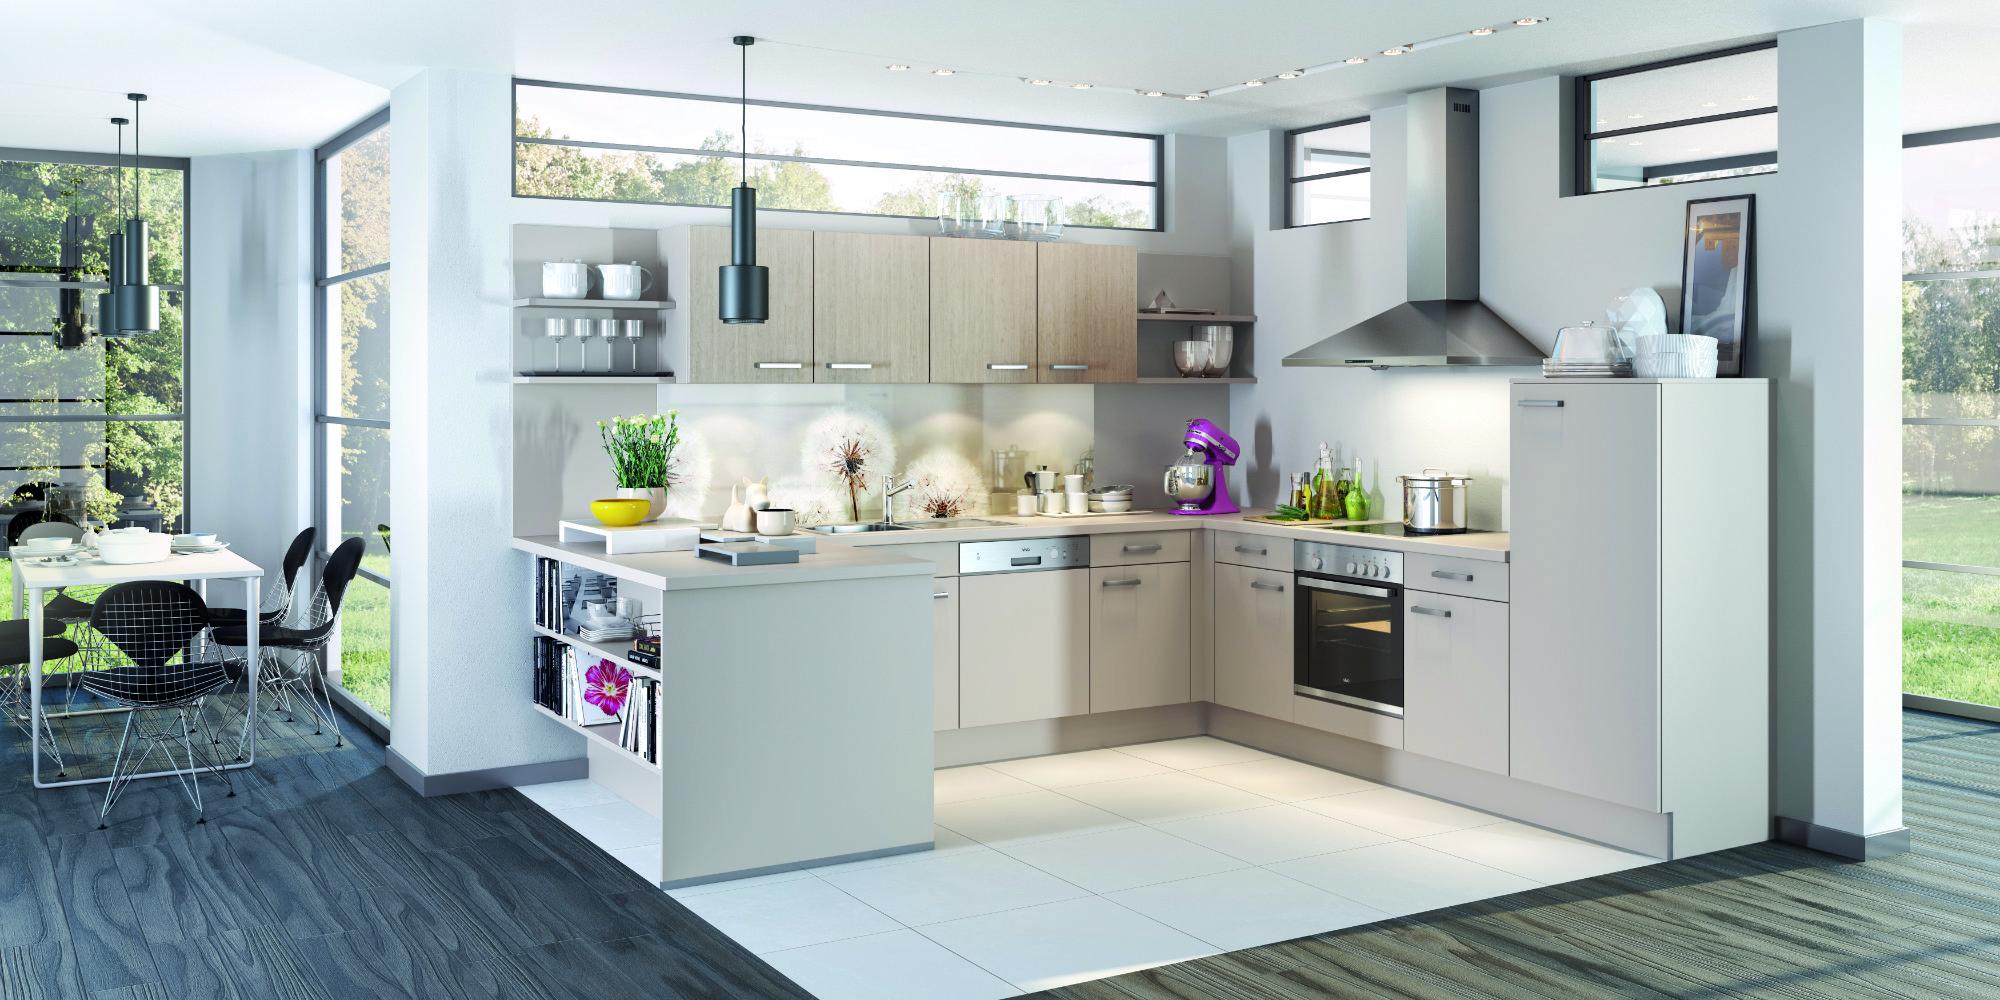 38 small kitchen layout ideas uk display  house decor